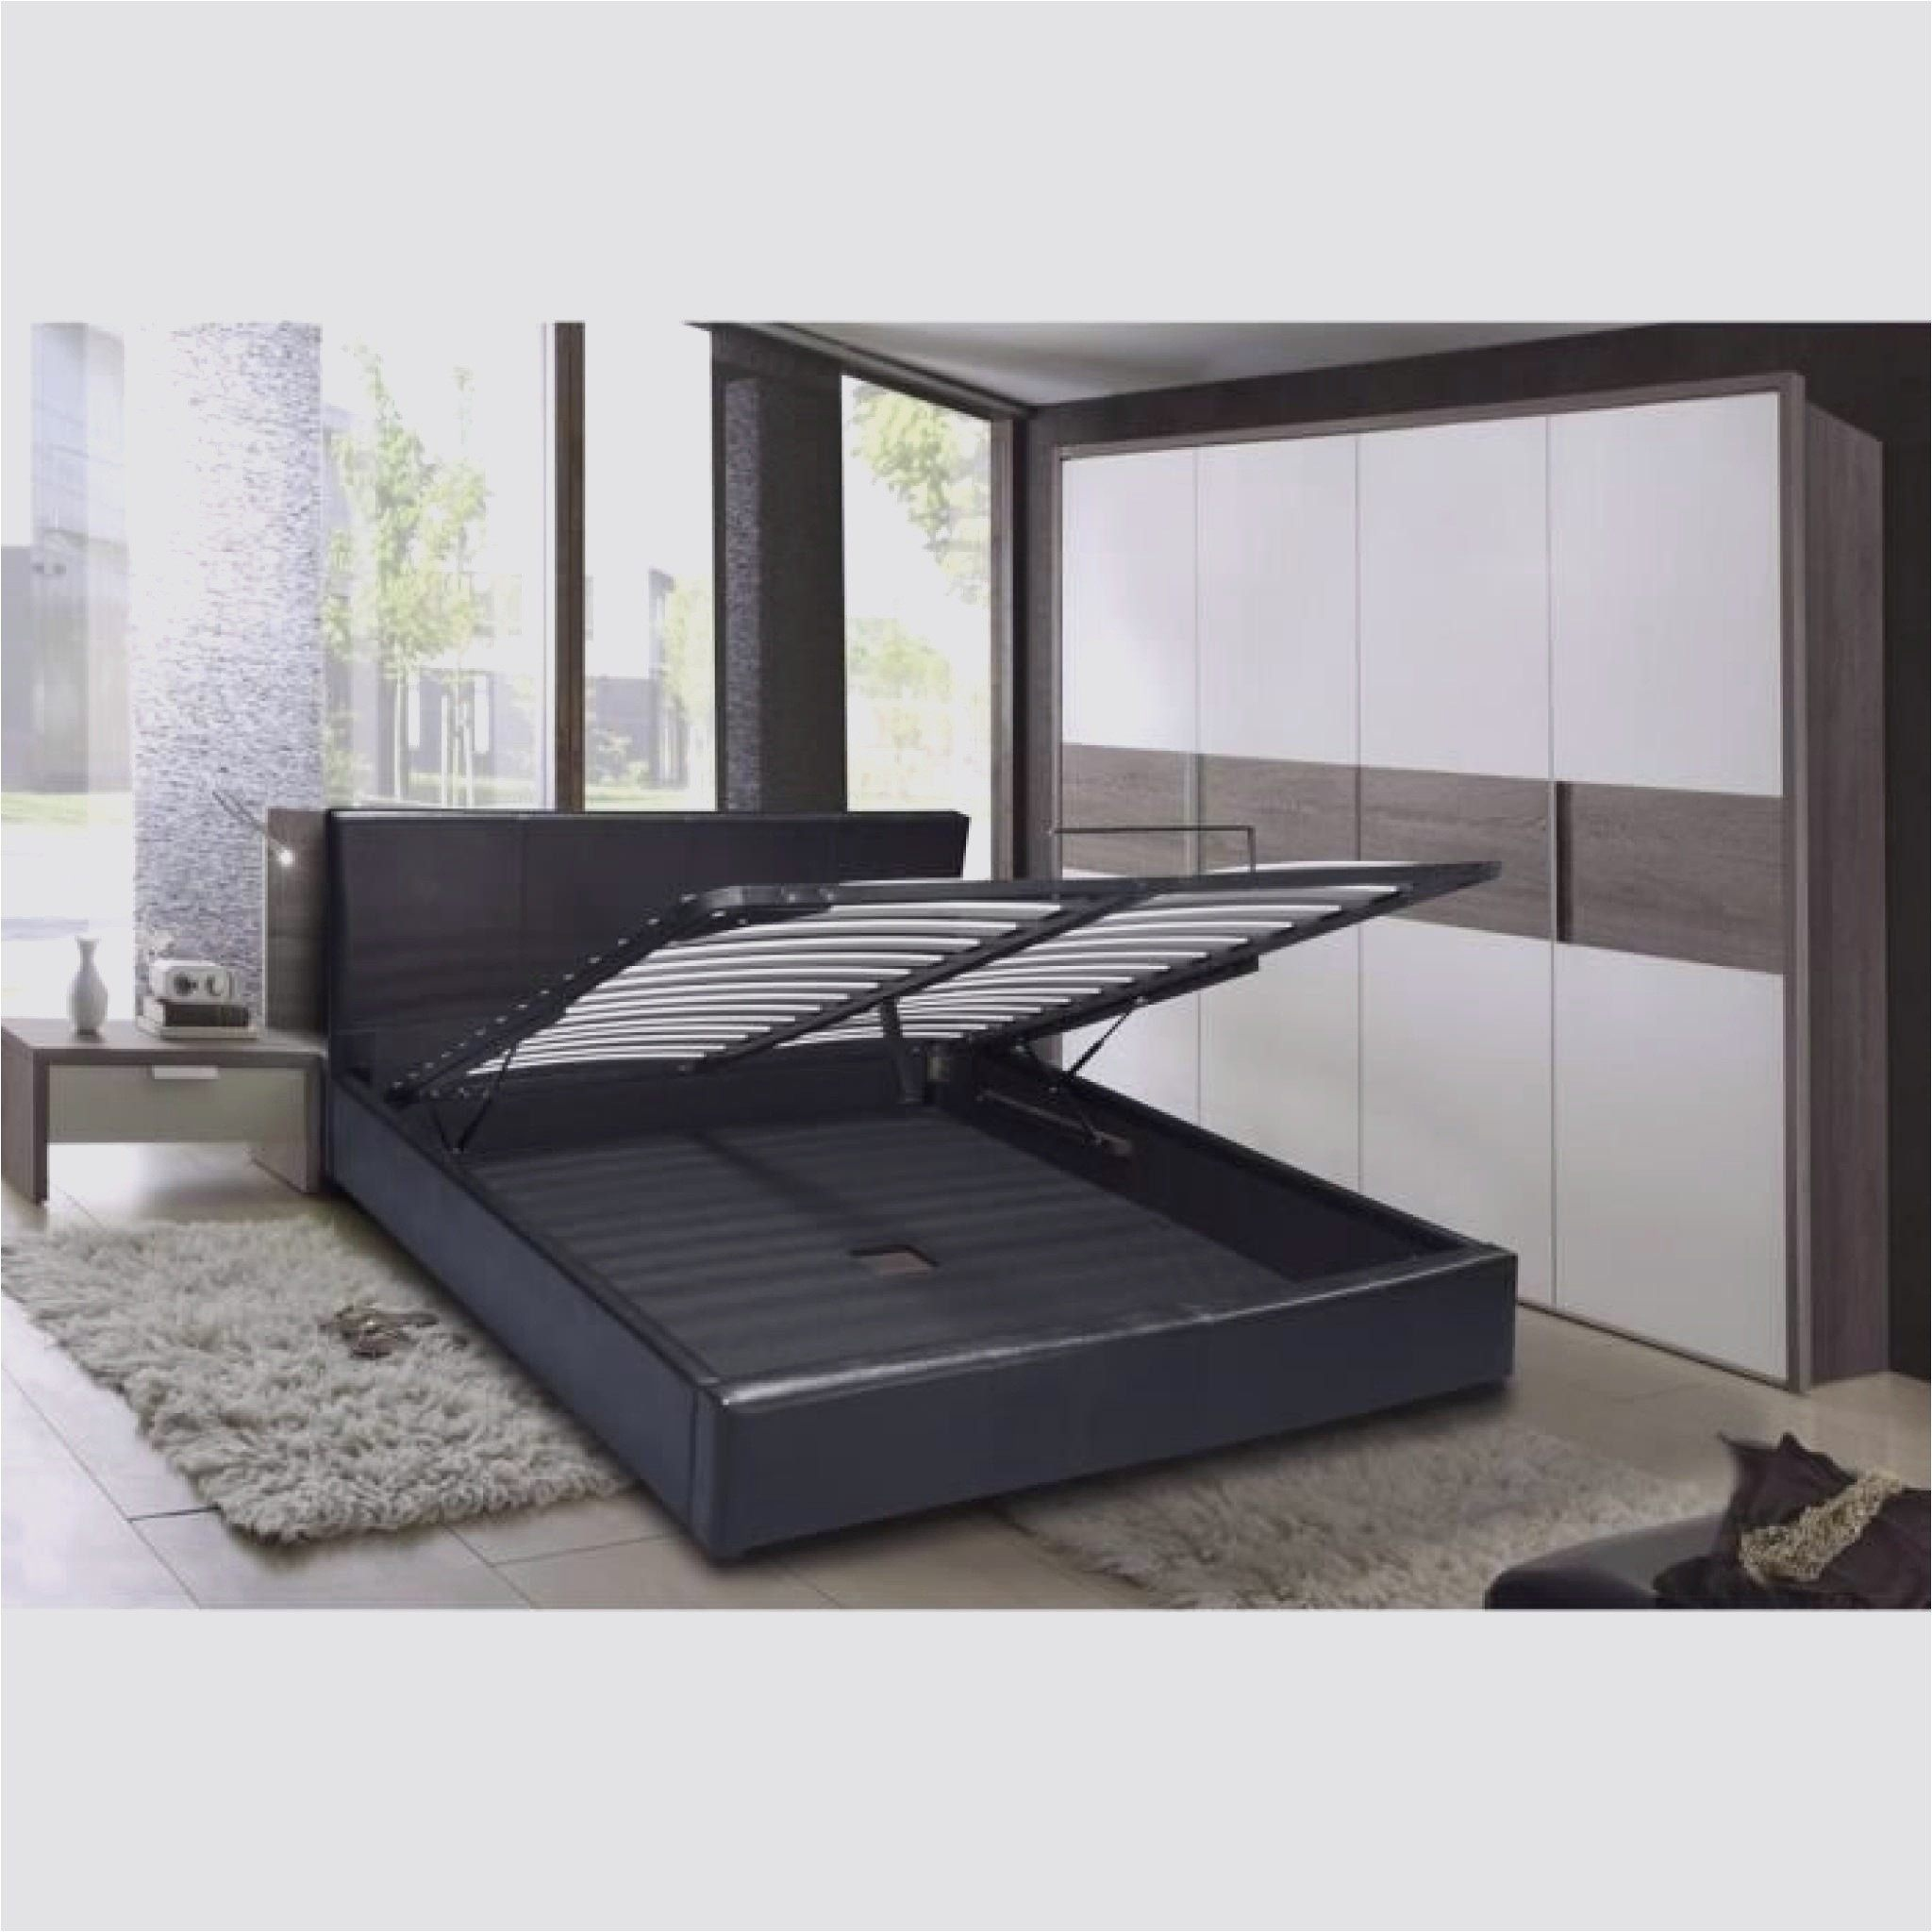 Ikea Lit Coffre Luxe Lit 80 190 Lit Coffre 90—190 Conforama Rare Tiroir De Lit Conforama